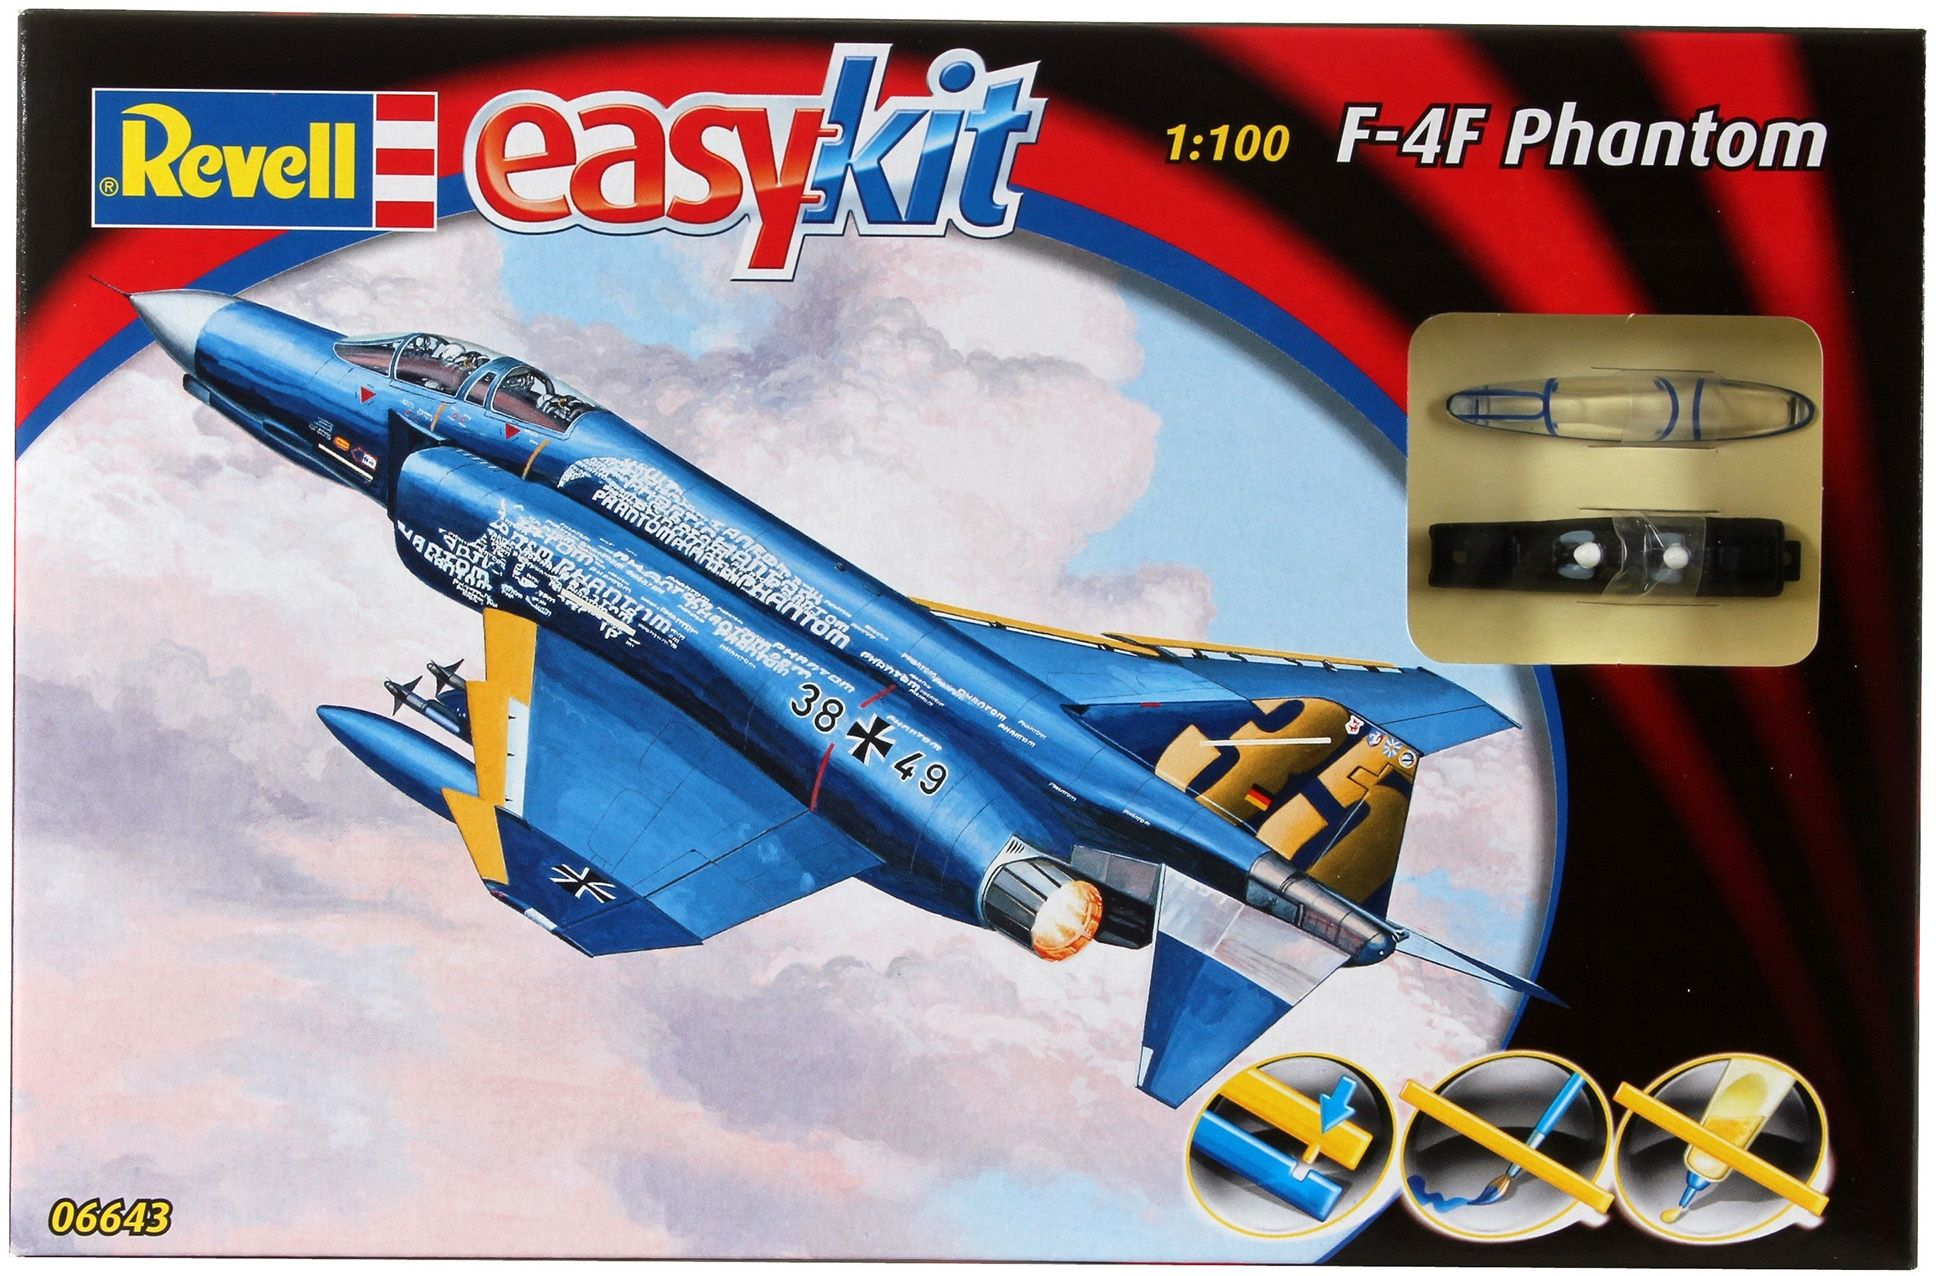 Сглобяем модел на изтребител Revell Easykit - F-4F Phantom (06643) - 4